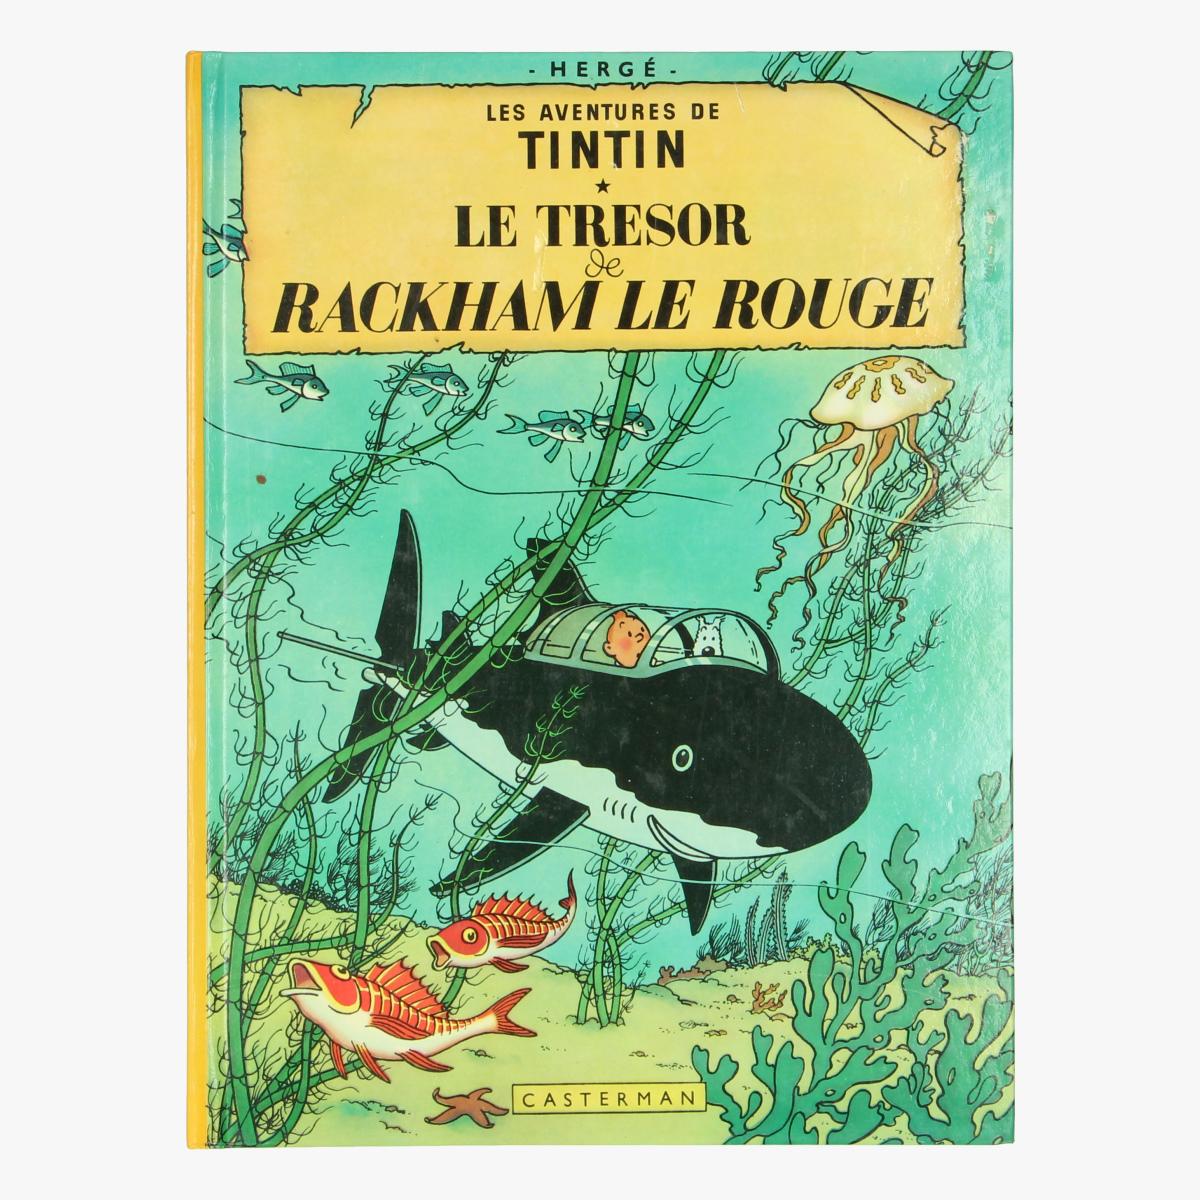 Afbeeldingen van Le tresor de rackham le rouge - Tin Tin - Kuifje